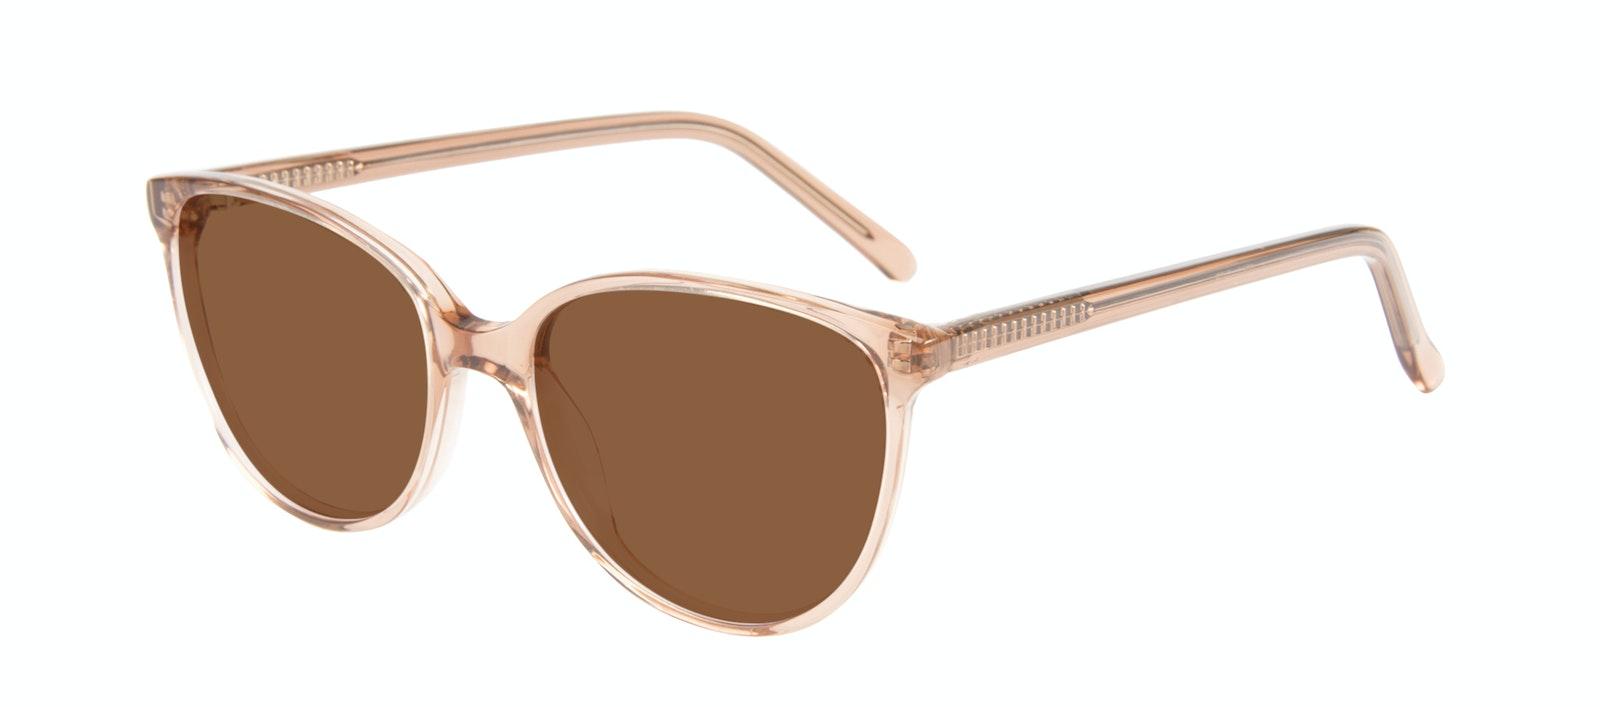 Affordable Fashion Glasses Round Sunglasses Women Imagine Petite Rose Tilt